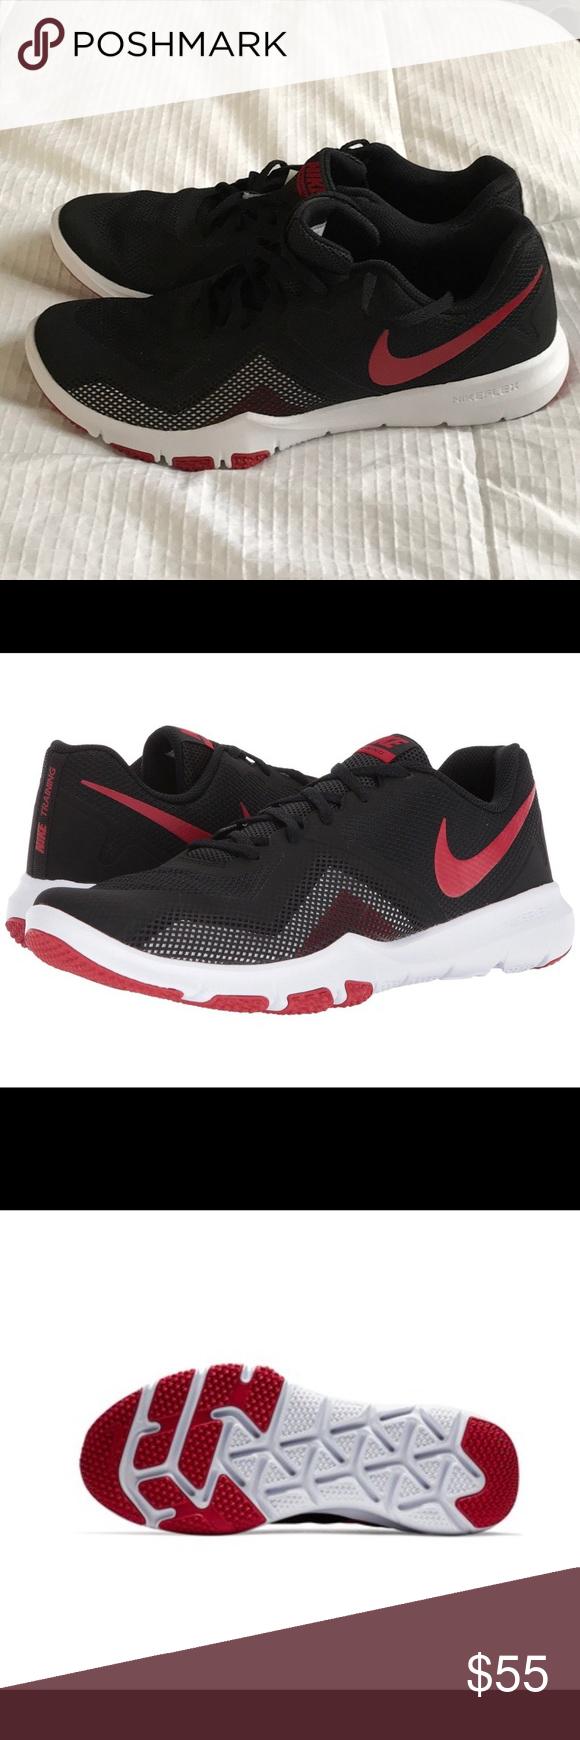 403d6b5d7b14 Nike Flex Control II Black Gym Red Trainers NEW Black   Gym Red - Soft